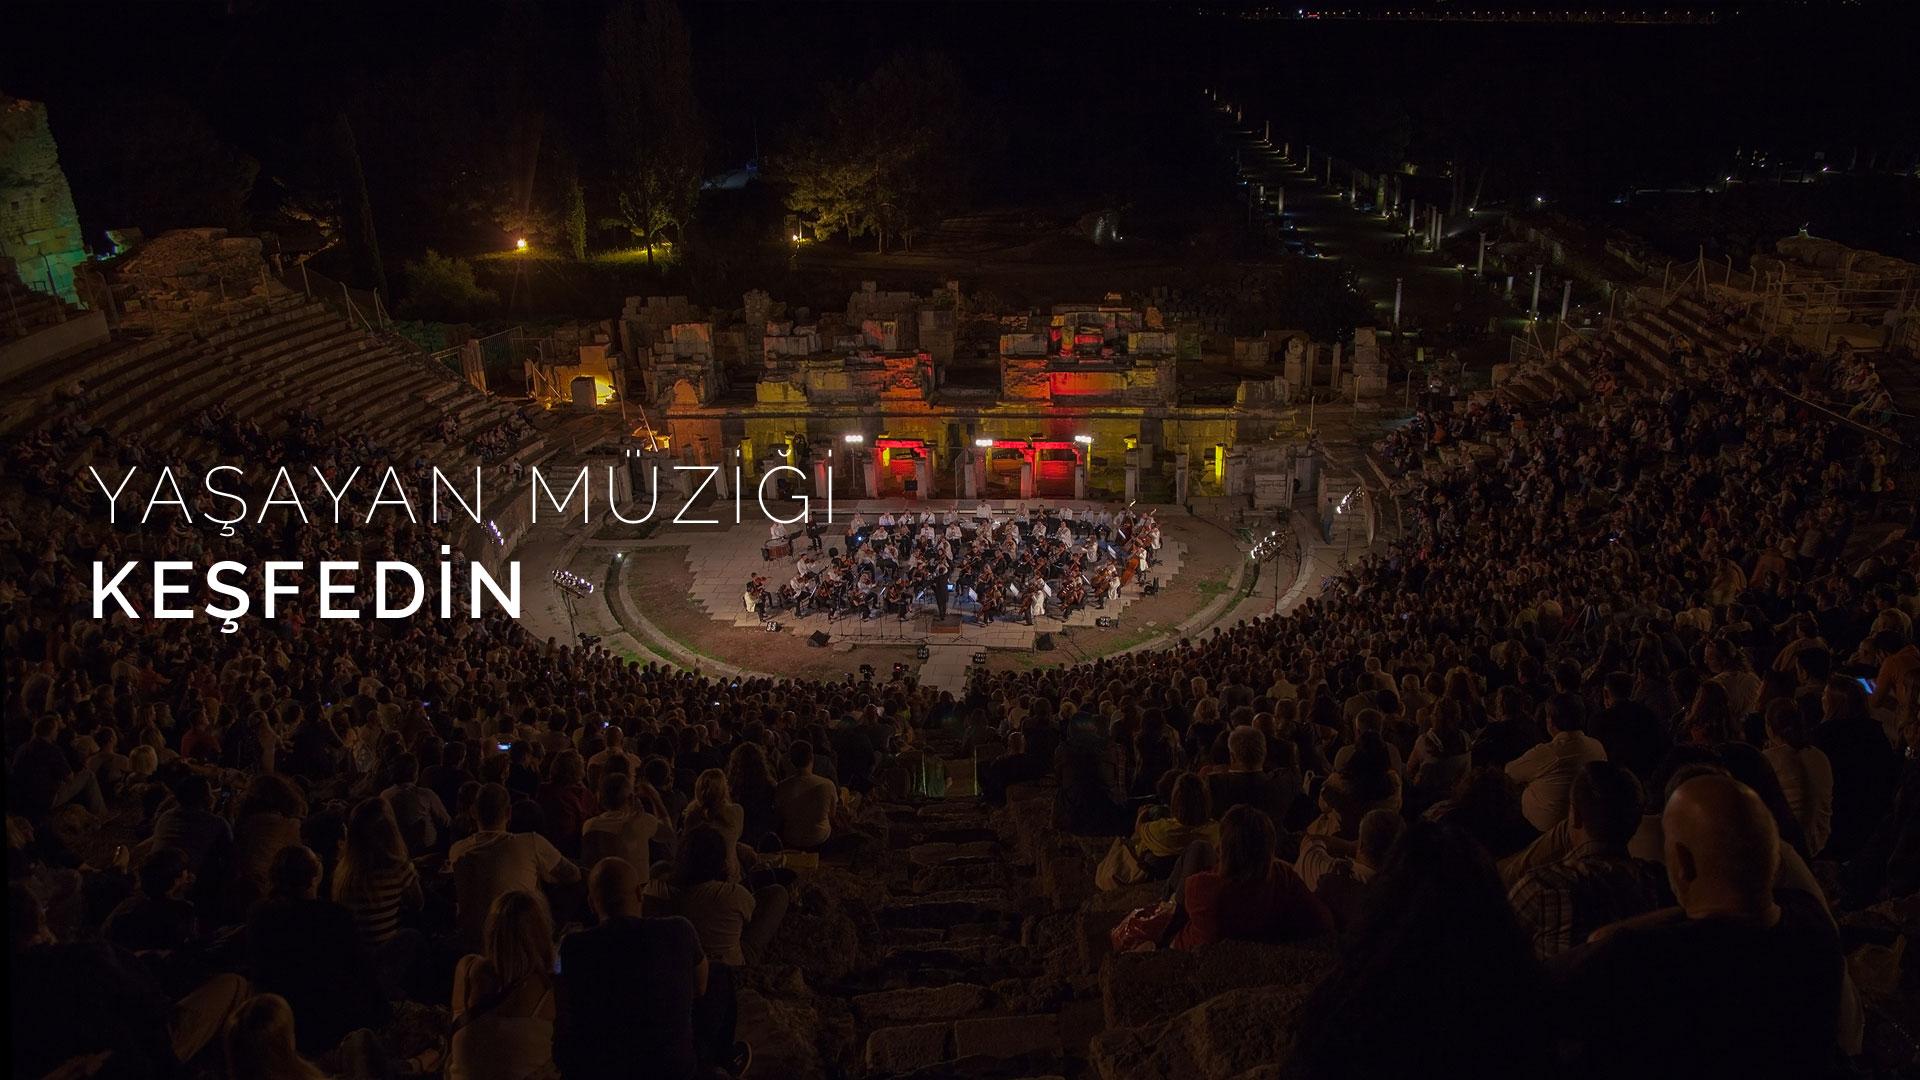 izdso-izmir-devlet-senfoni-orkestrasi